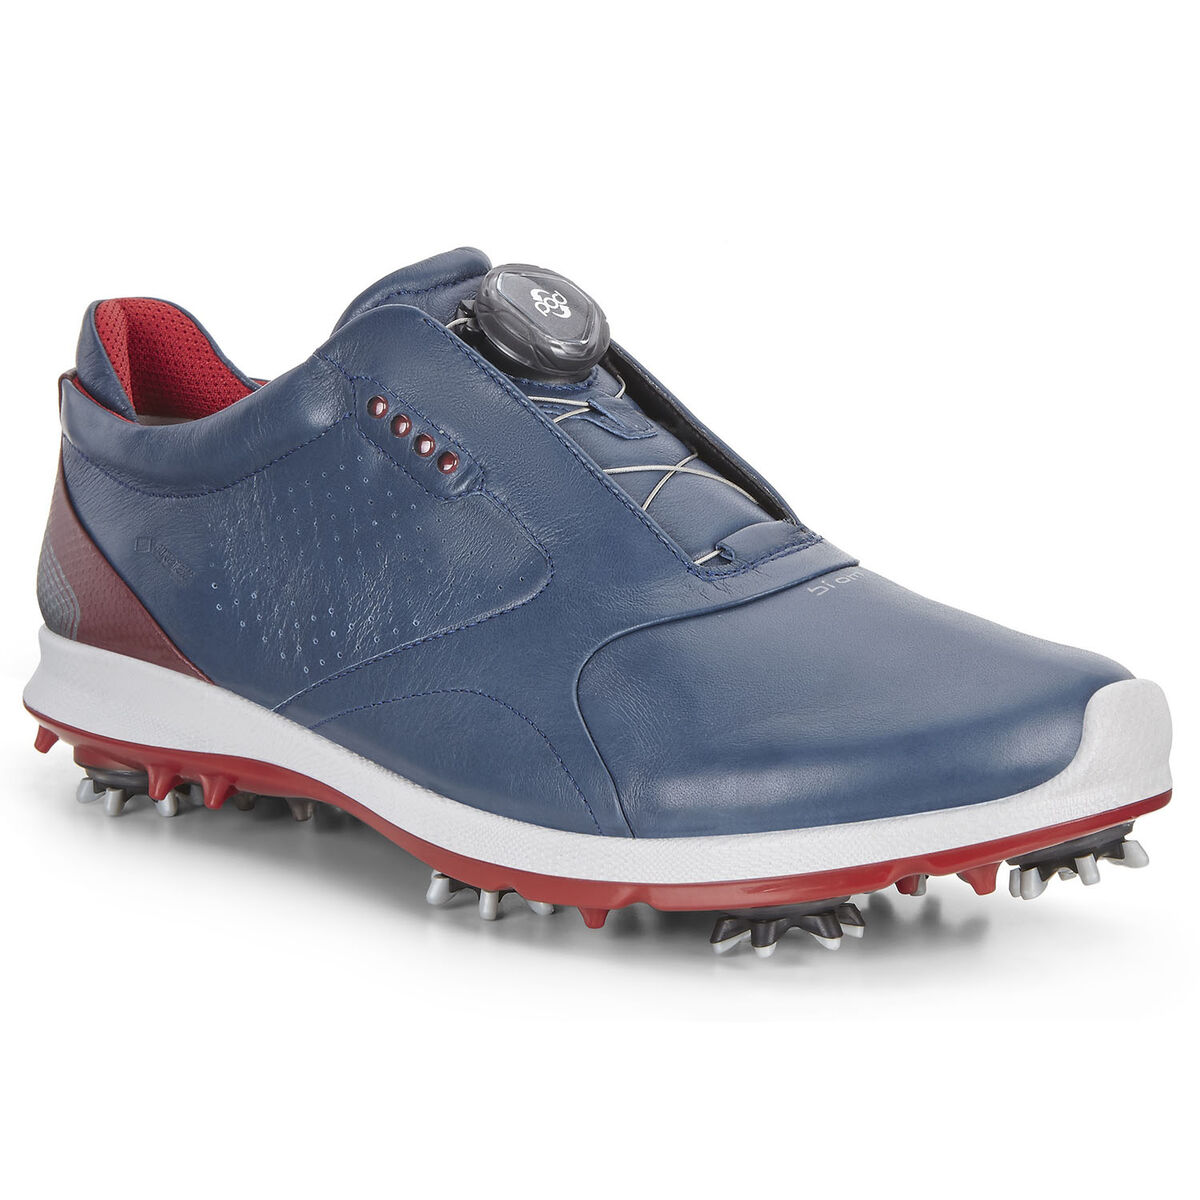 9cb26d759d6f ECCO BIOM G2 BOA Men s Golf Shoe - Navy Red